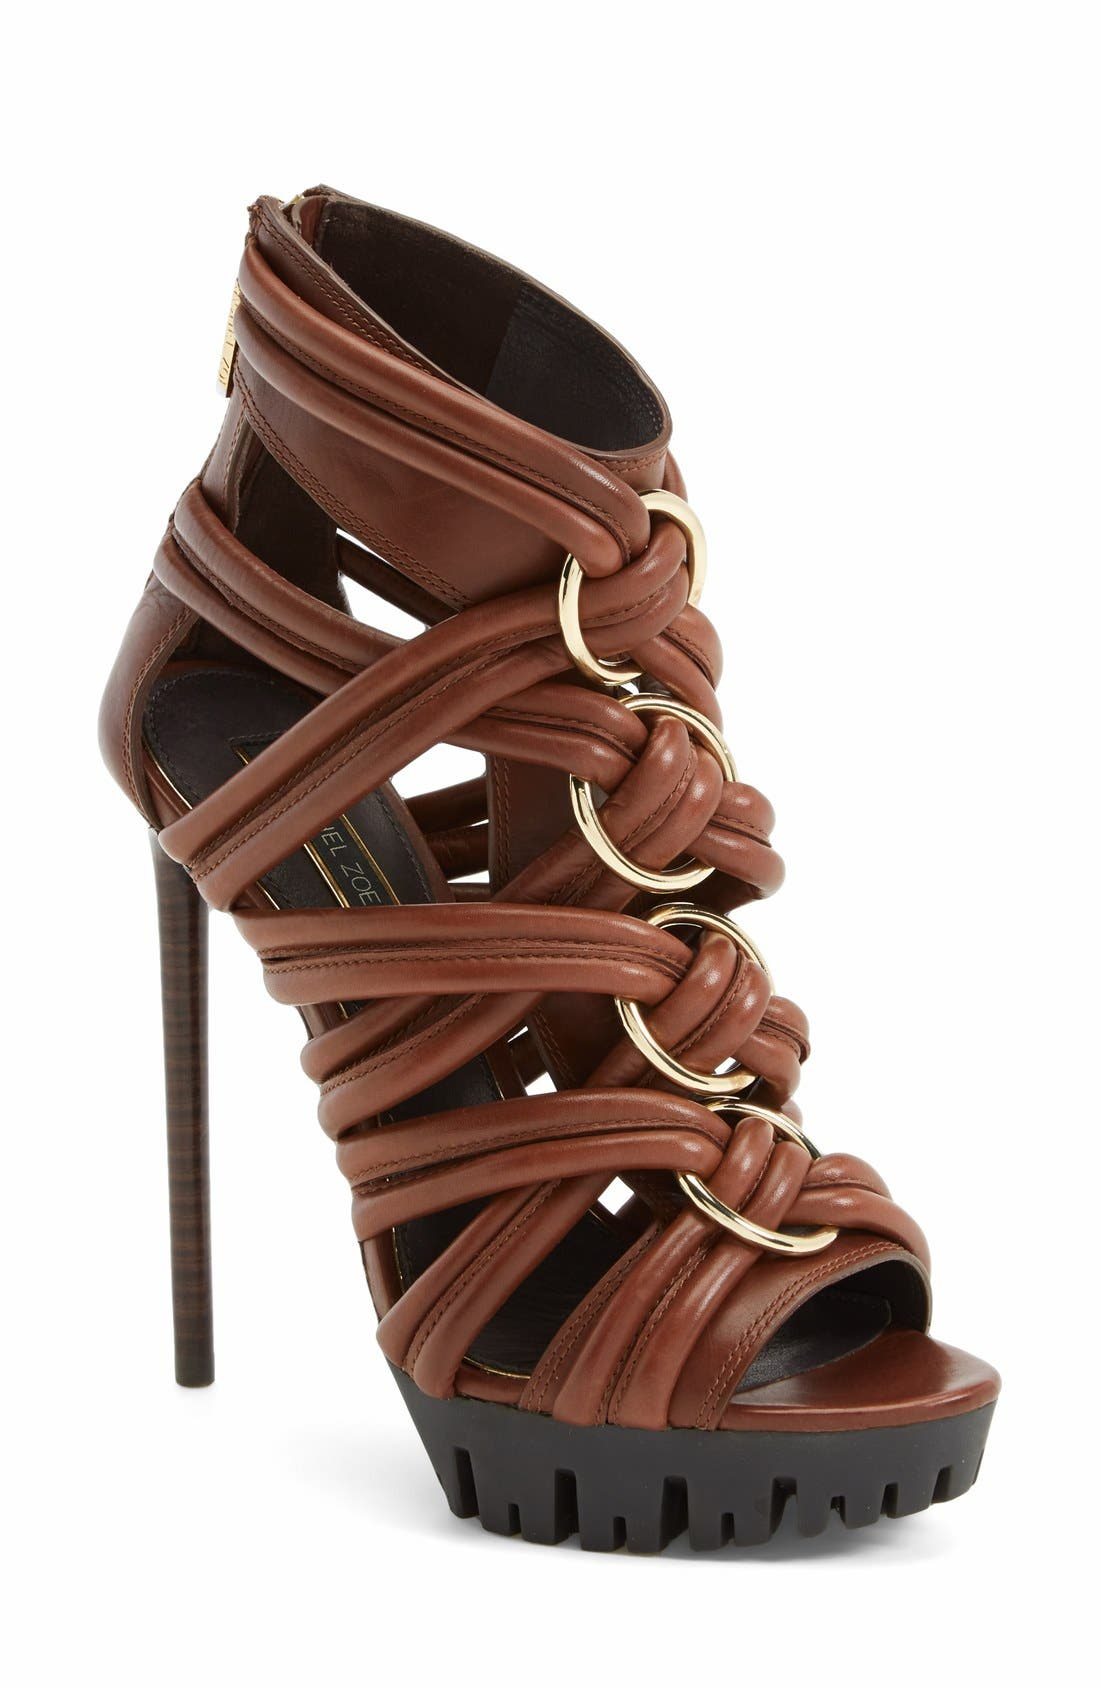 Alternate Image 1 Selected - Rachel Zoe 'Harlin' Leather Sandal (Women)